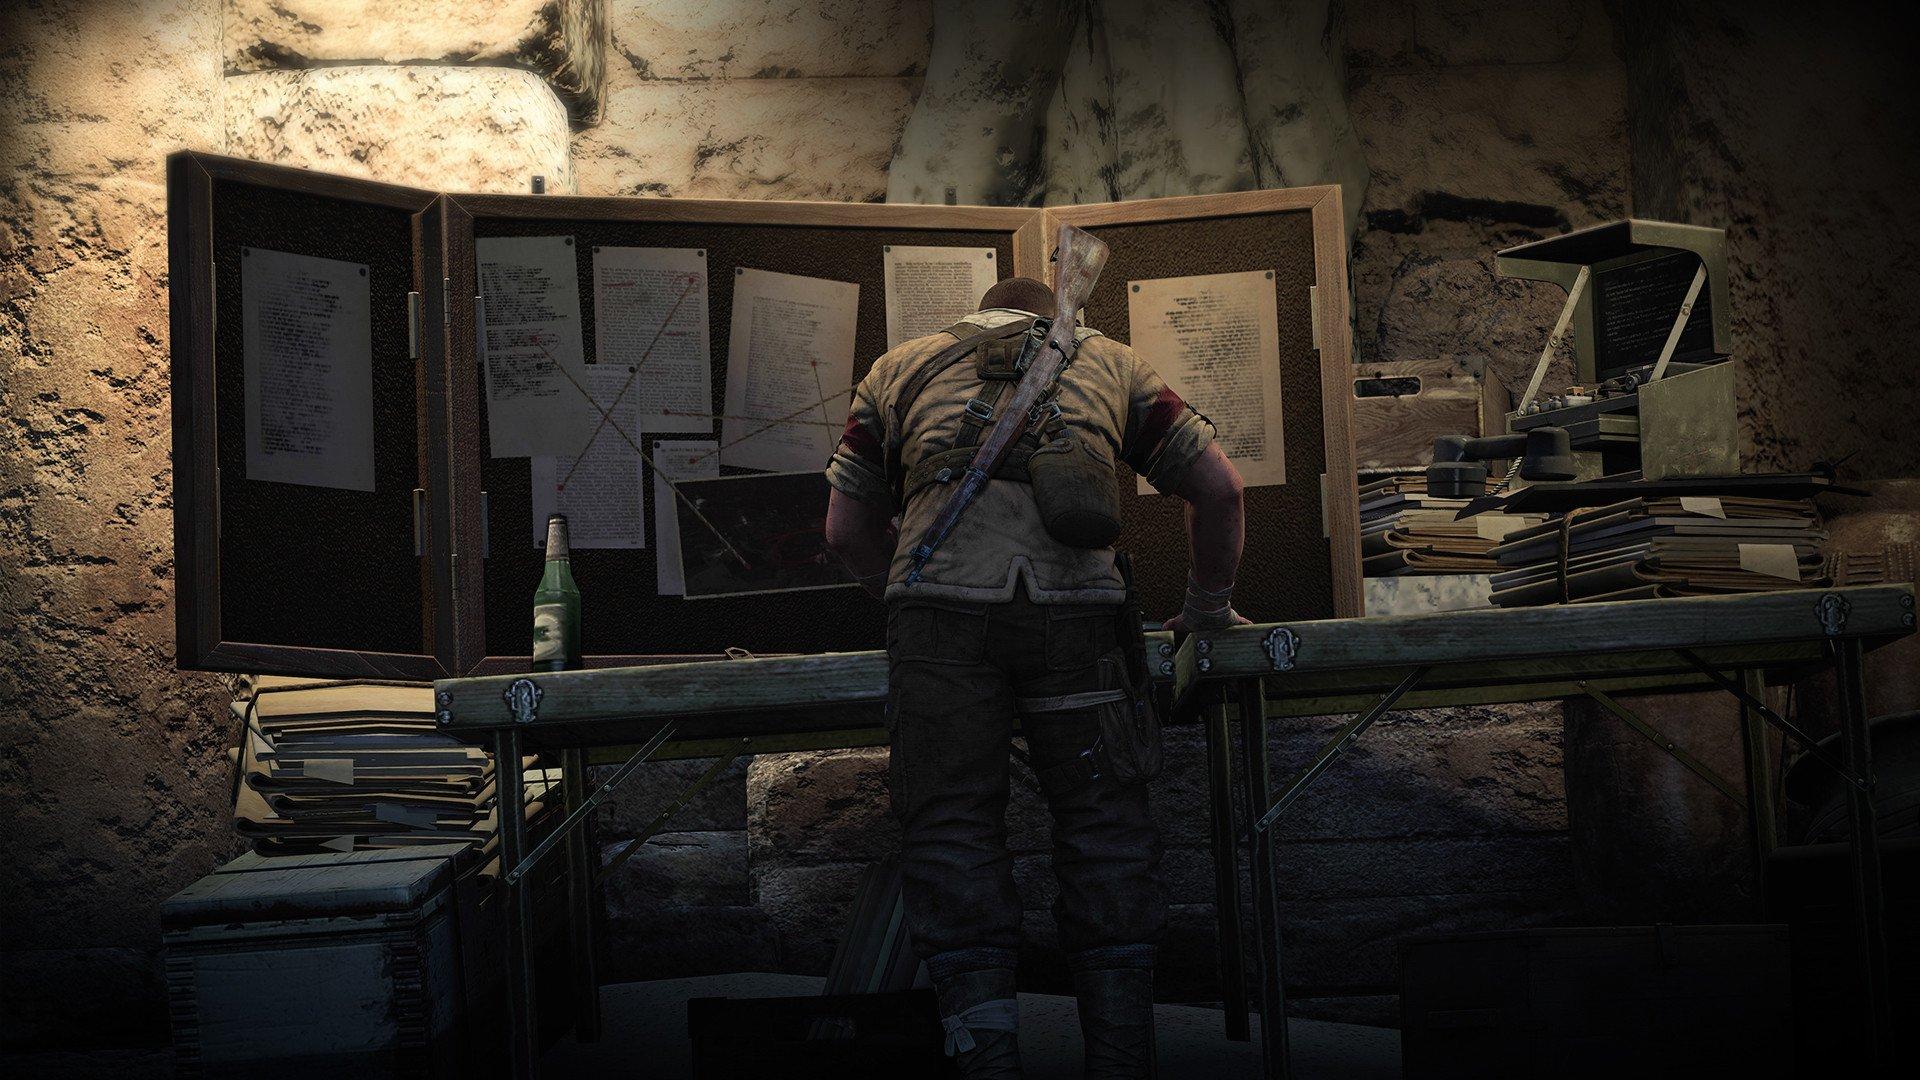 sniper elite 3 2537607 تصاویر جدیدی از Sniper Elite 3 منتشر شد : بیابان گردی در آفریقا